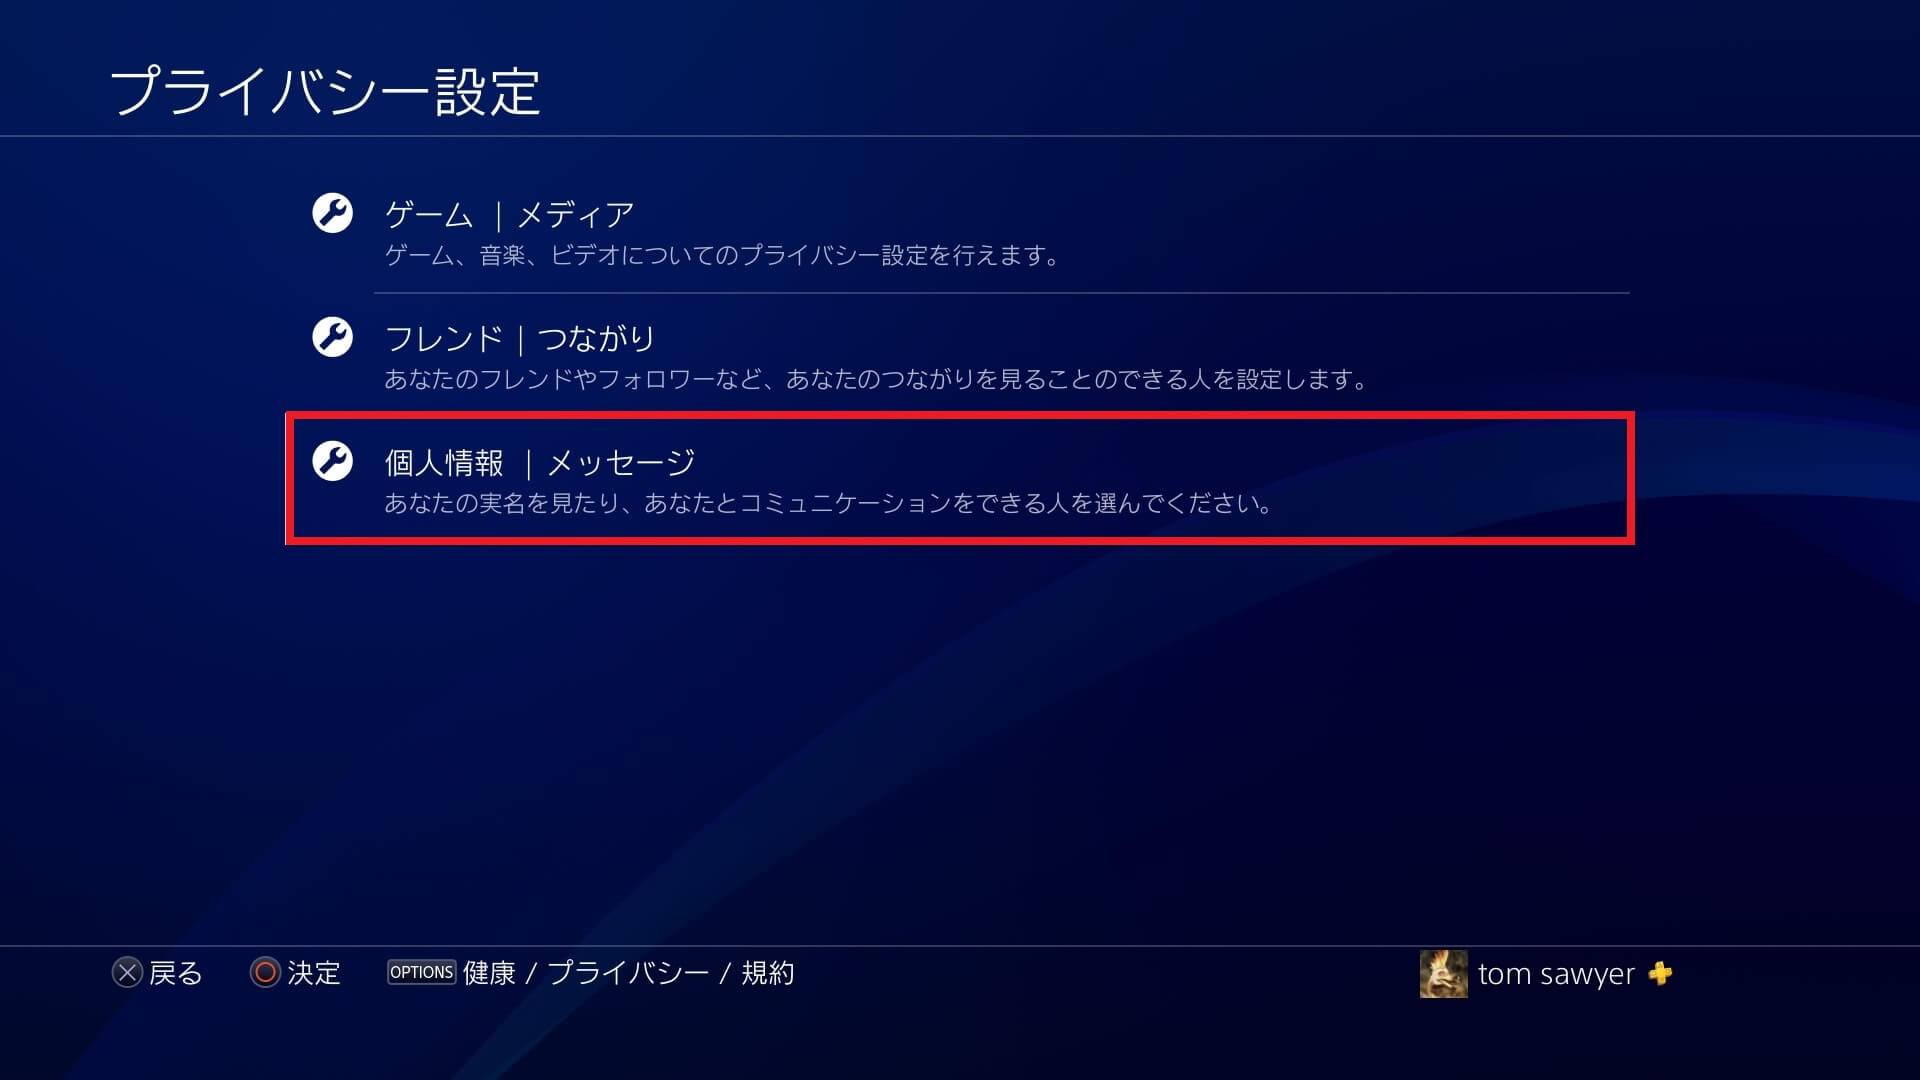 PS4プライバシー設定